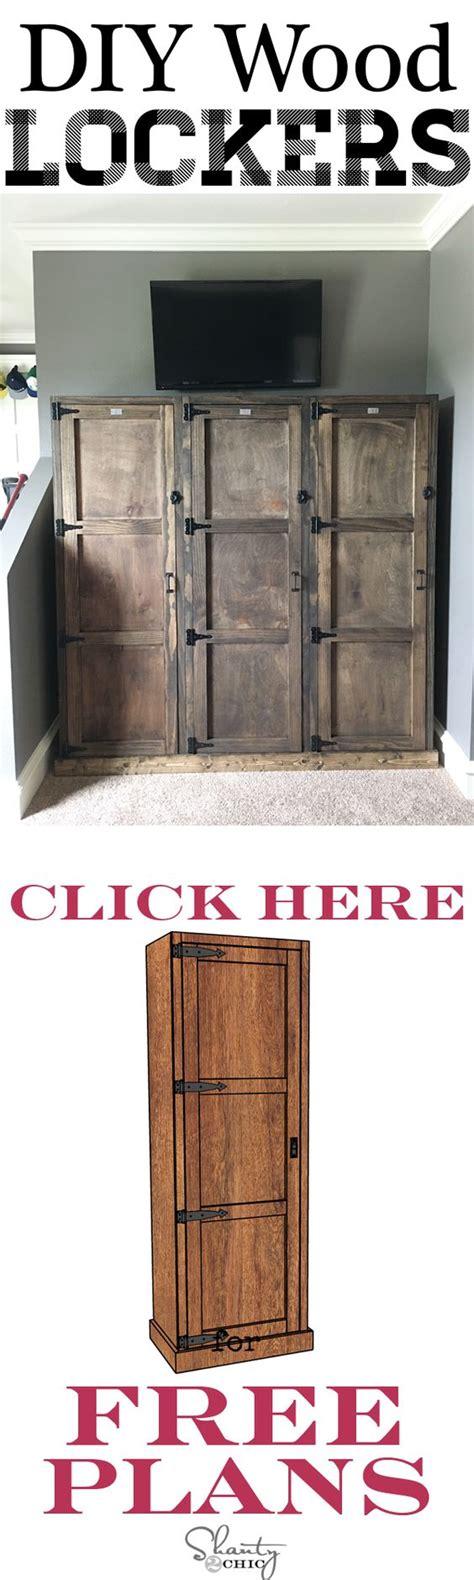 diy locker system clothing storage diy  crafts